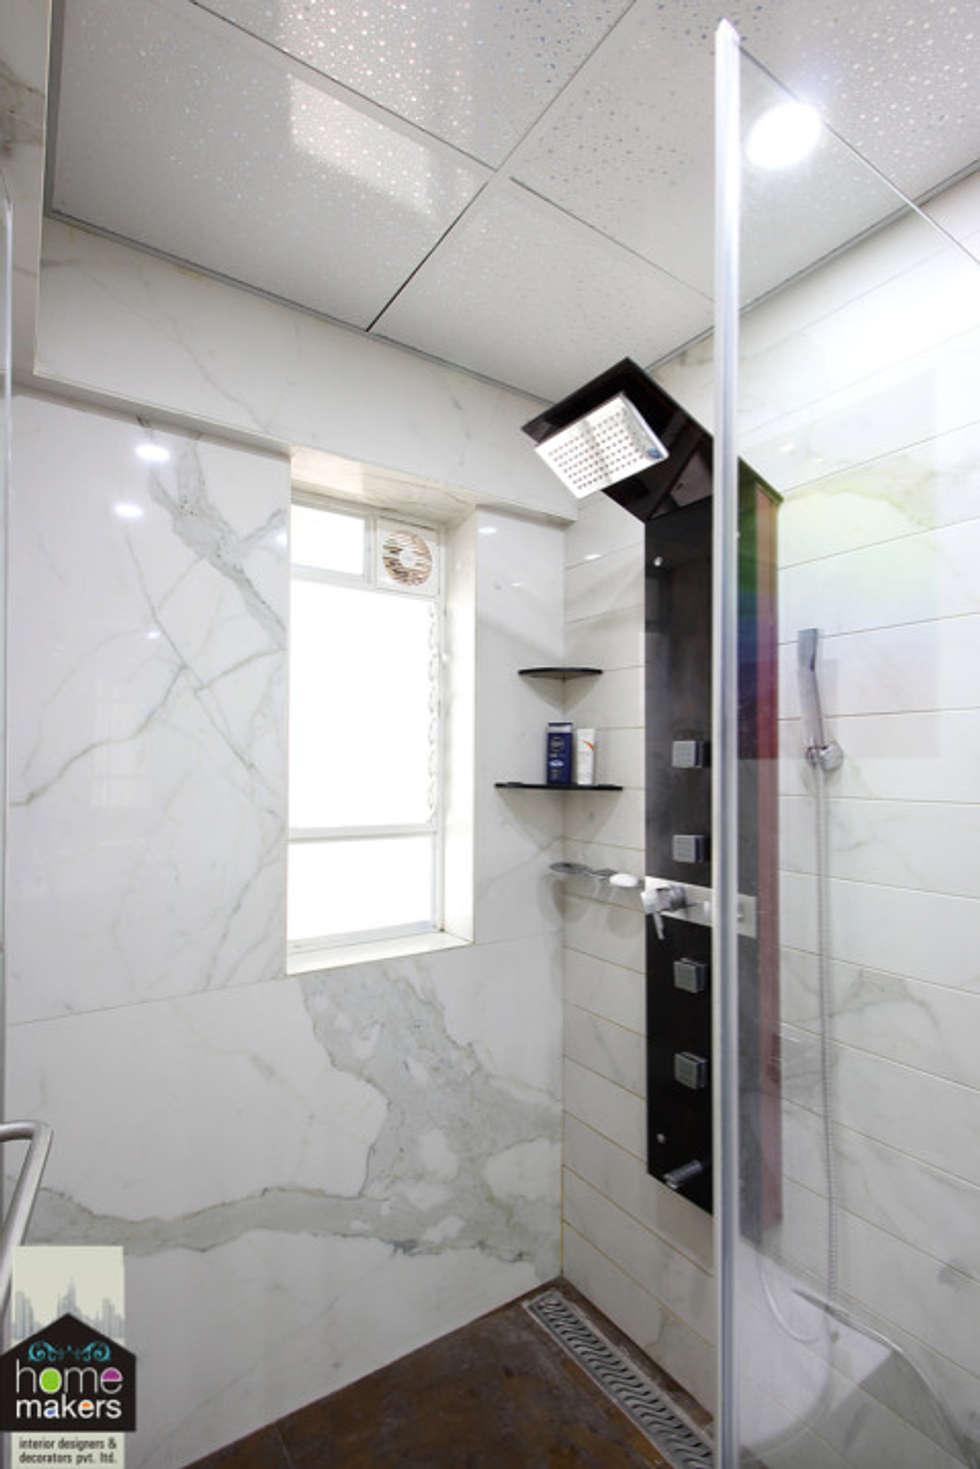 Master washroom 2: modern bathroom by home makers interior designers ...